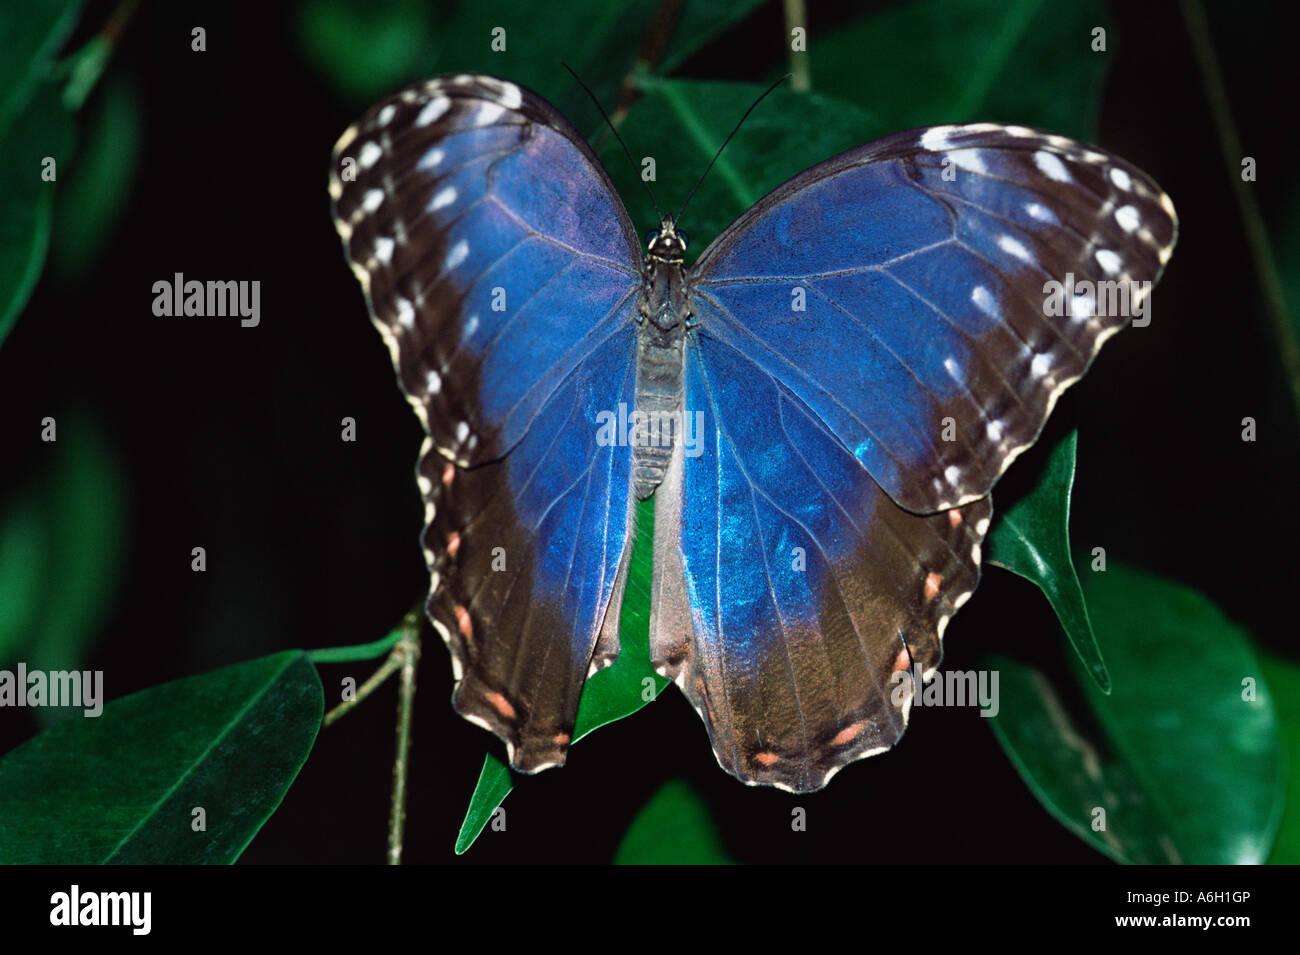 Mariposa Azul sobre una hoja Imagen De Stock